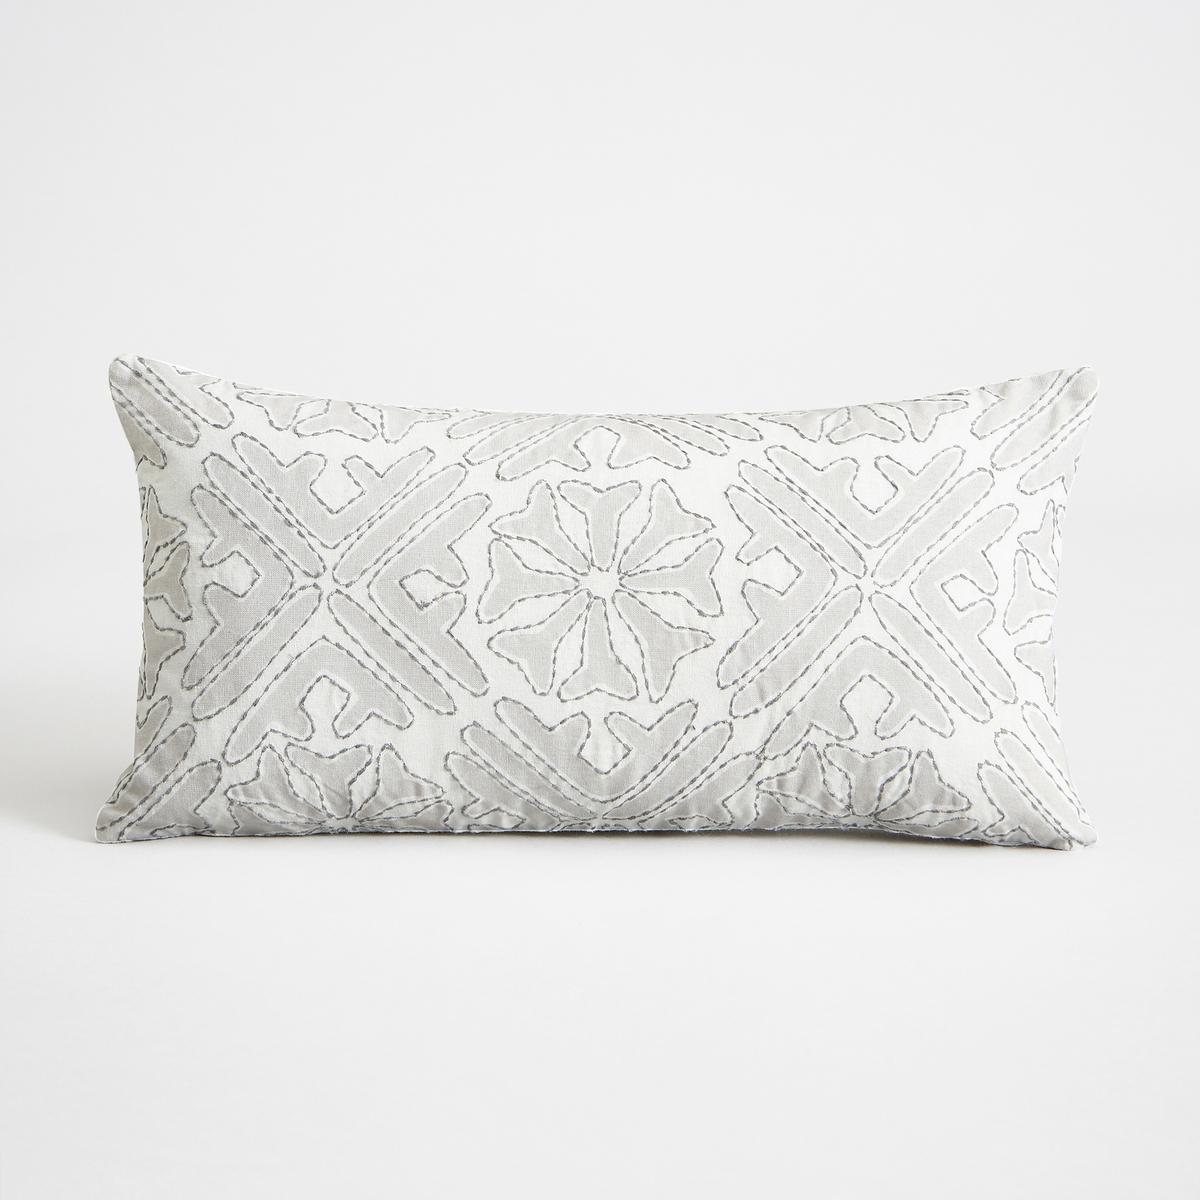 Наволочка на подушку-валик, Anzilu<br><br>Цвет: светло-серый